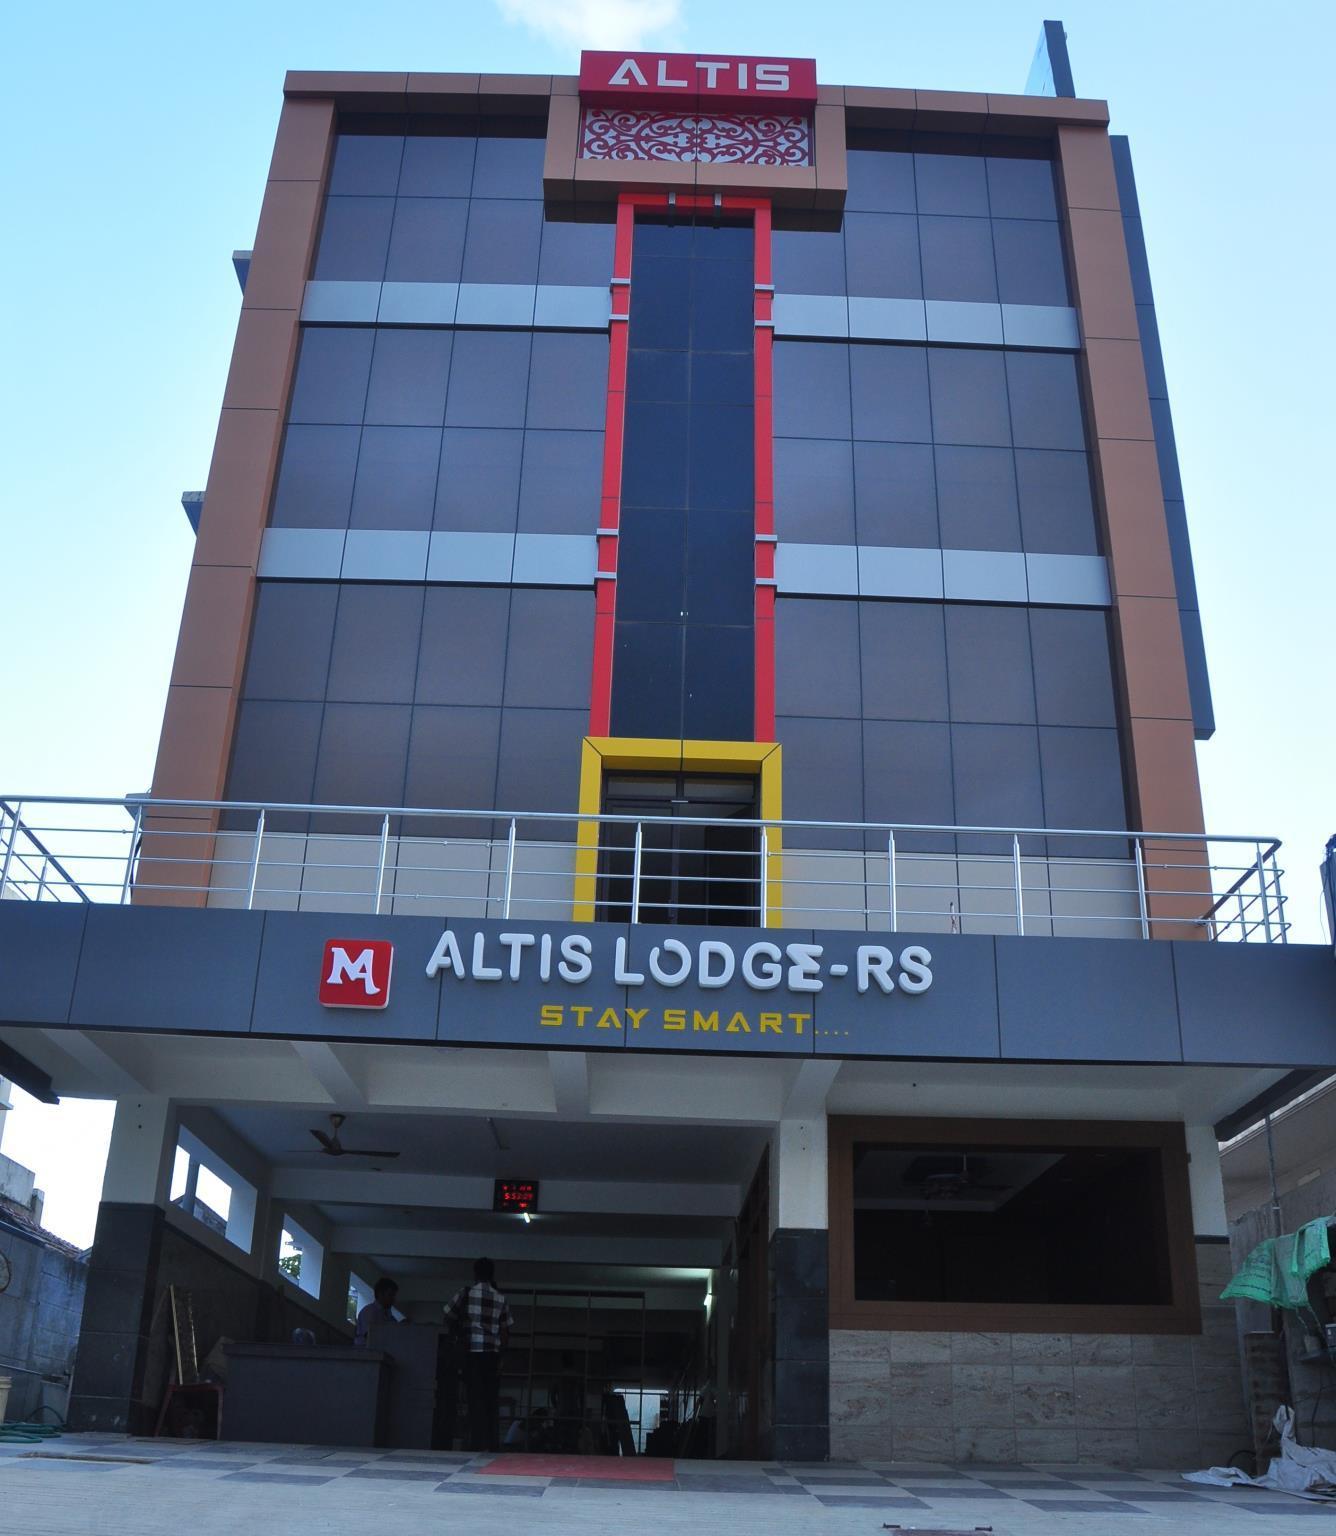 Altis Lodge